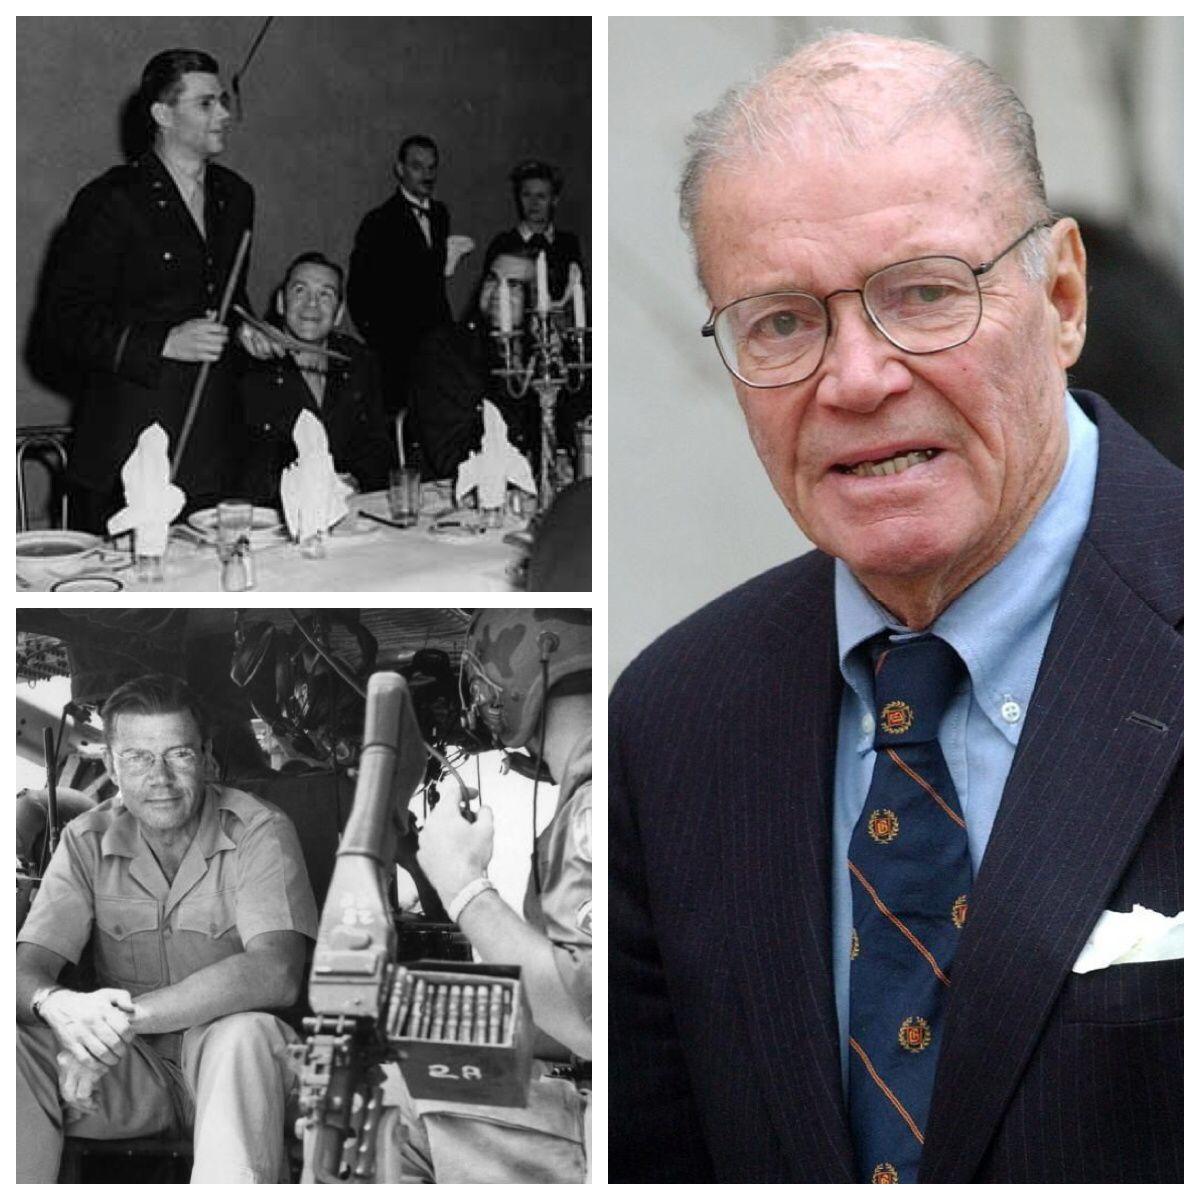 Robert McNamara-Air Force-WW2-1943-46-Lt. Colonel- Legion of Merit (8th US Secretary of Defense 1961-68-World Bank Group President)